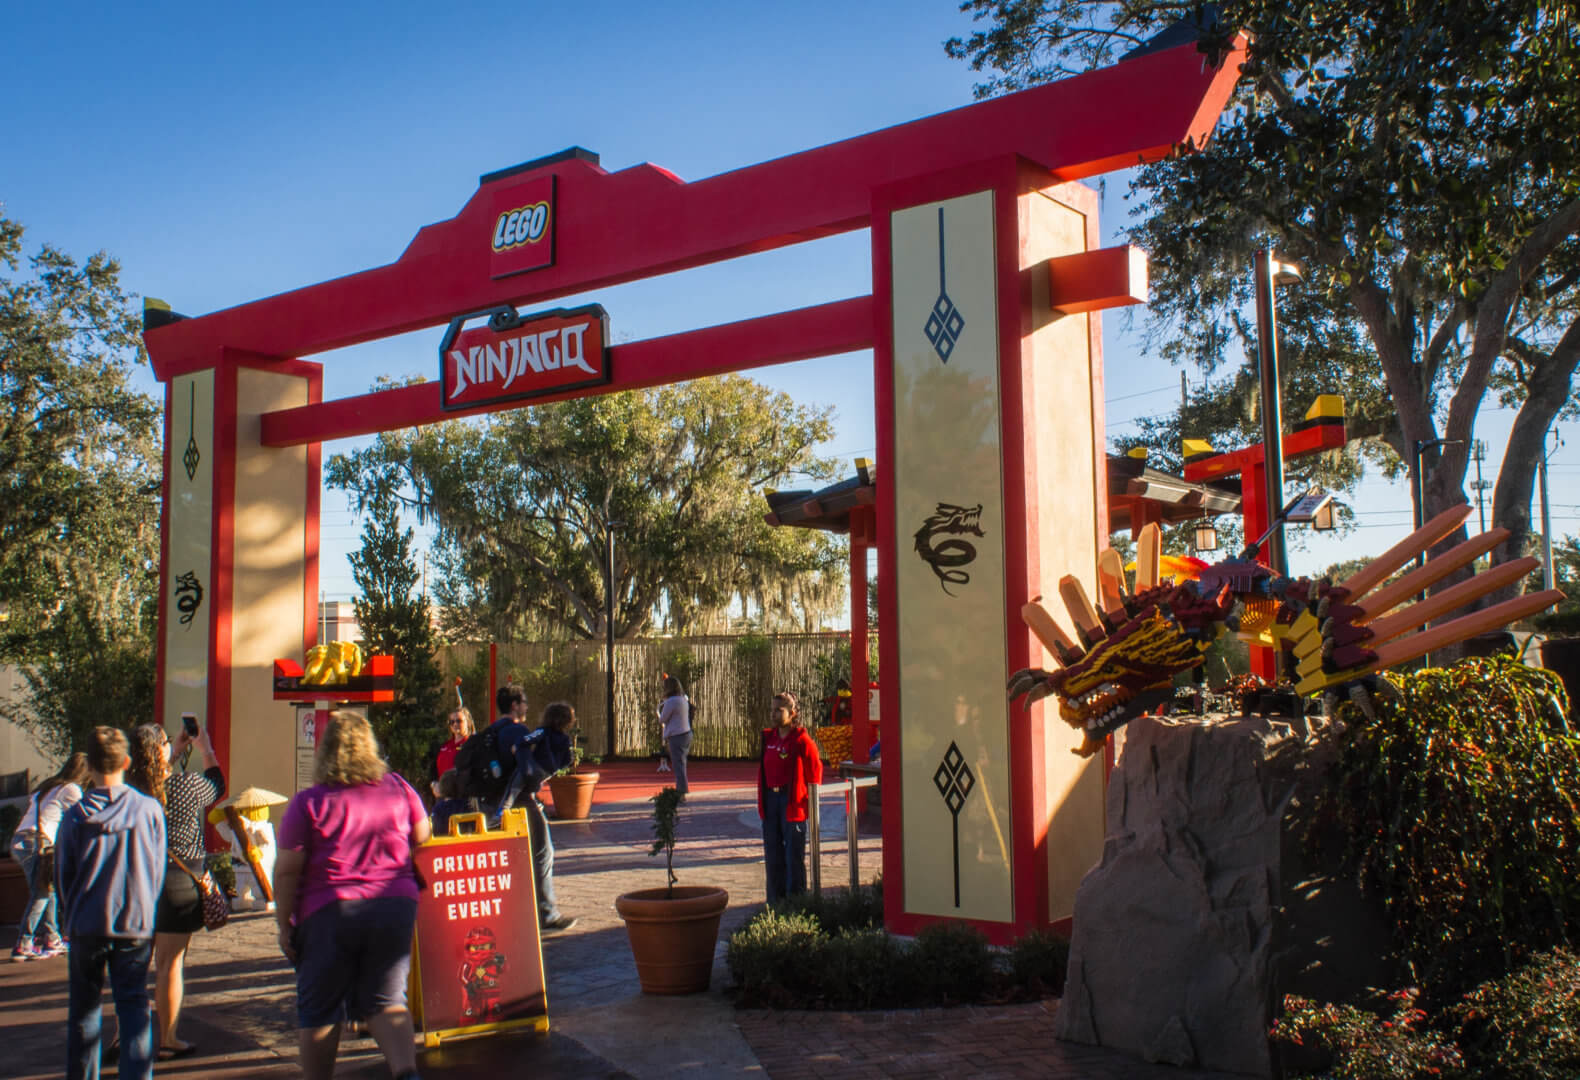 Lego Full House Lego Ninjago World Grand Opens At Legoland Florida With Fuller